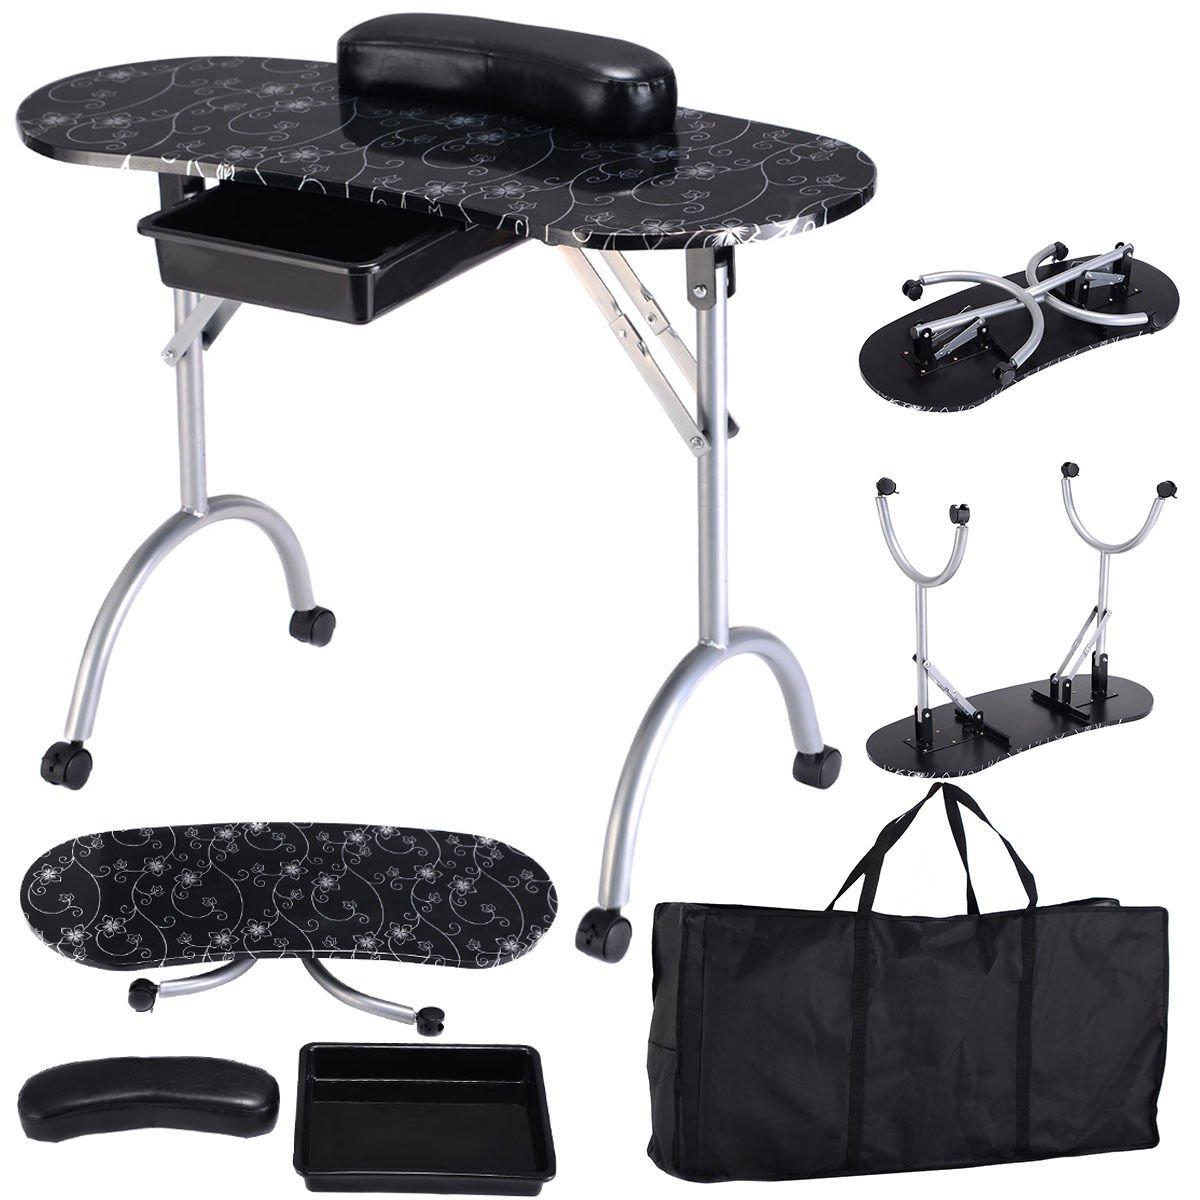 Amazon.com: Black Manicure Nail Table Portable Station Desk Spa ...